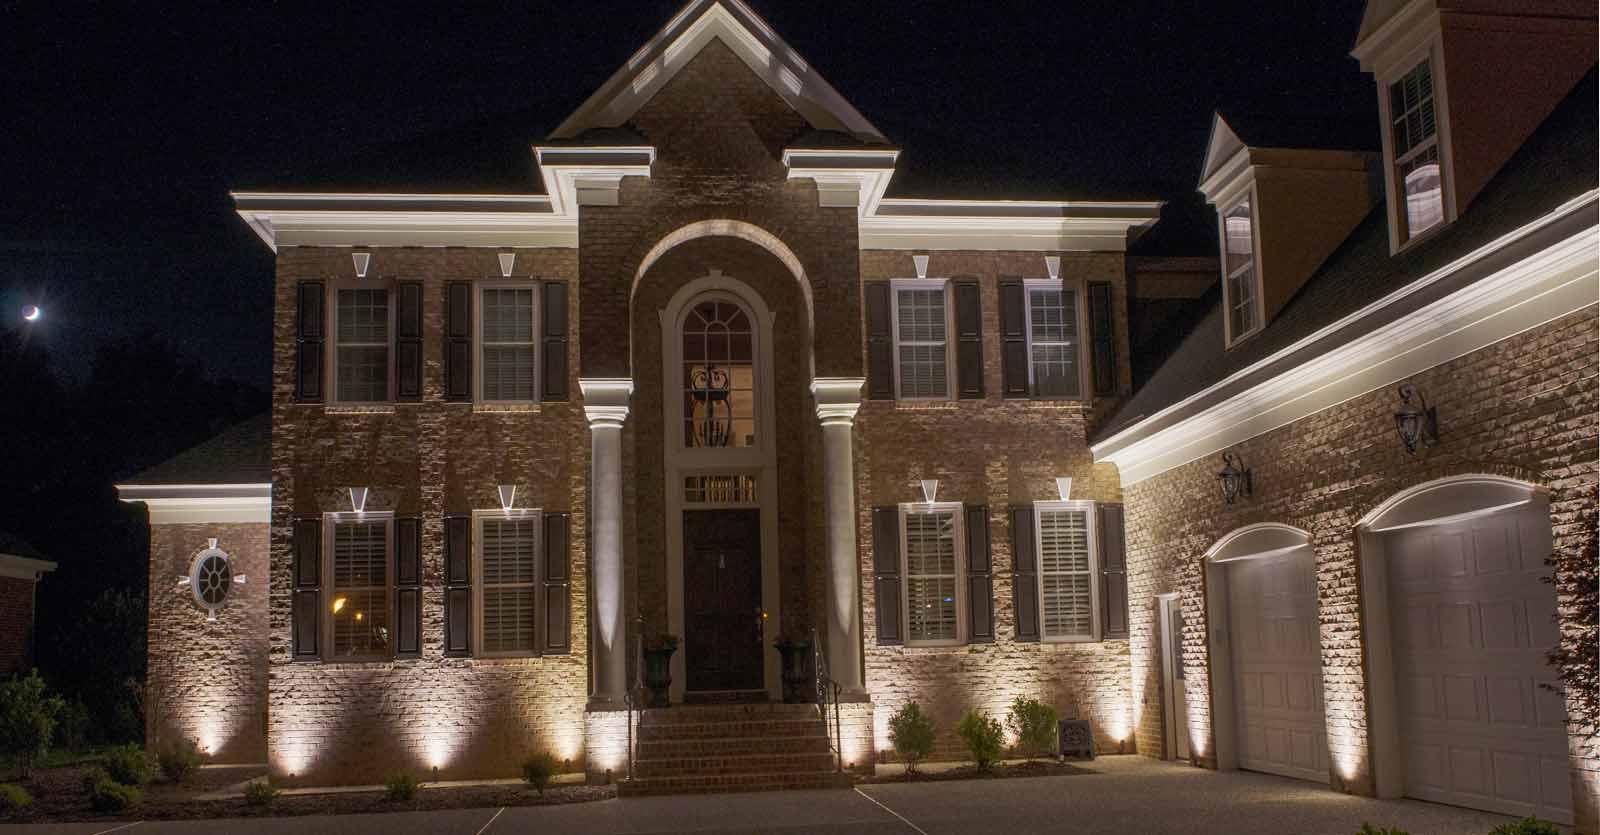 james city county outdoor lighting